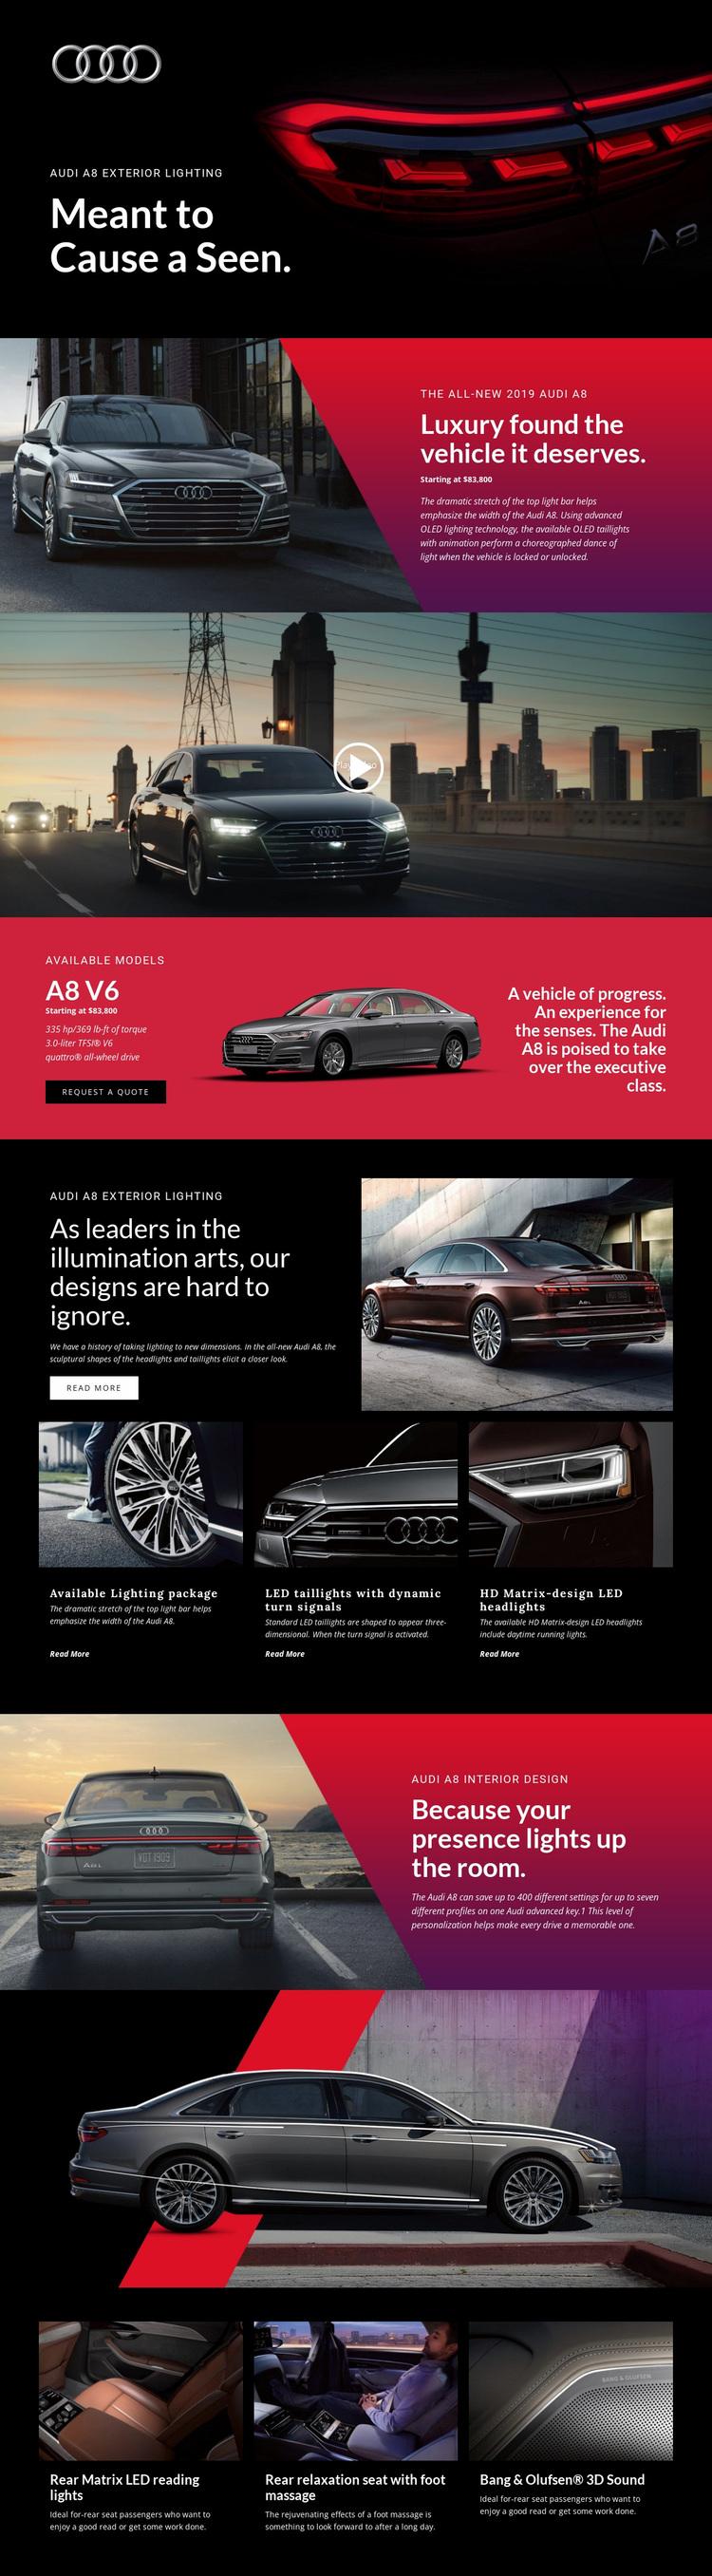 Audi luxury cars Website Design